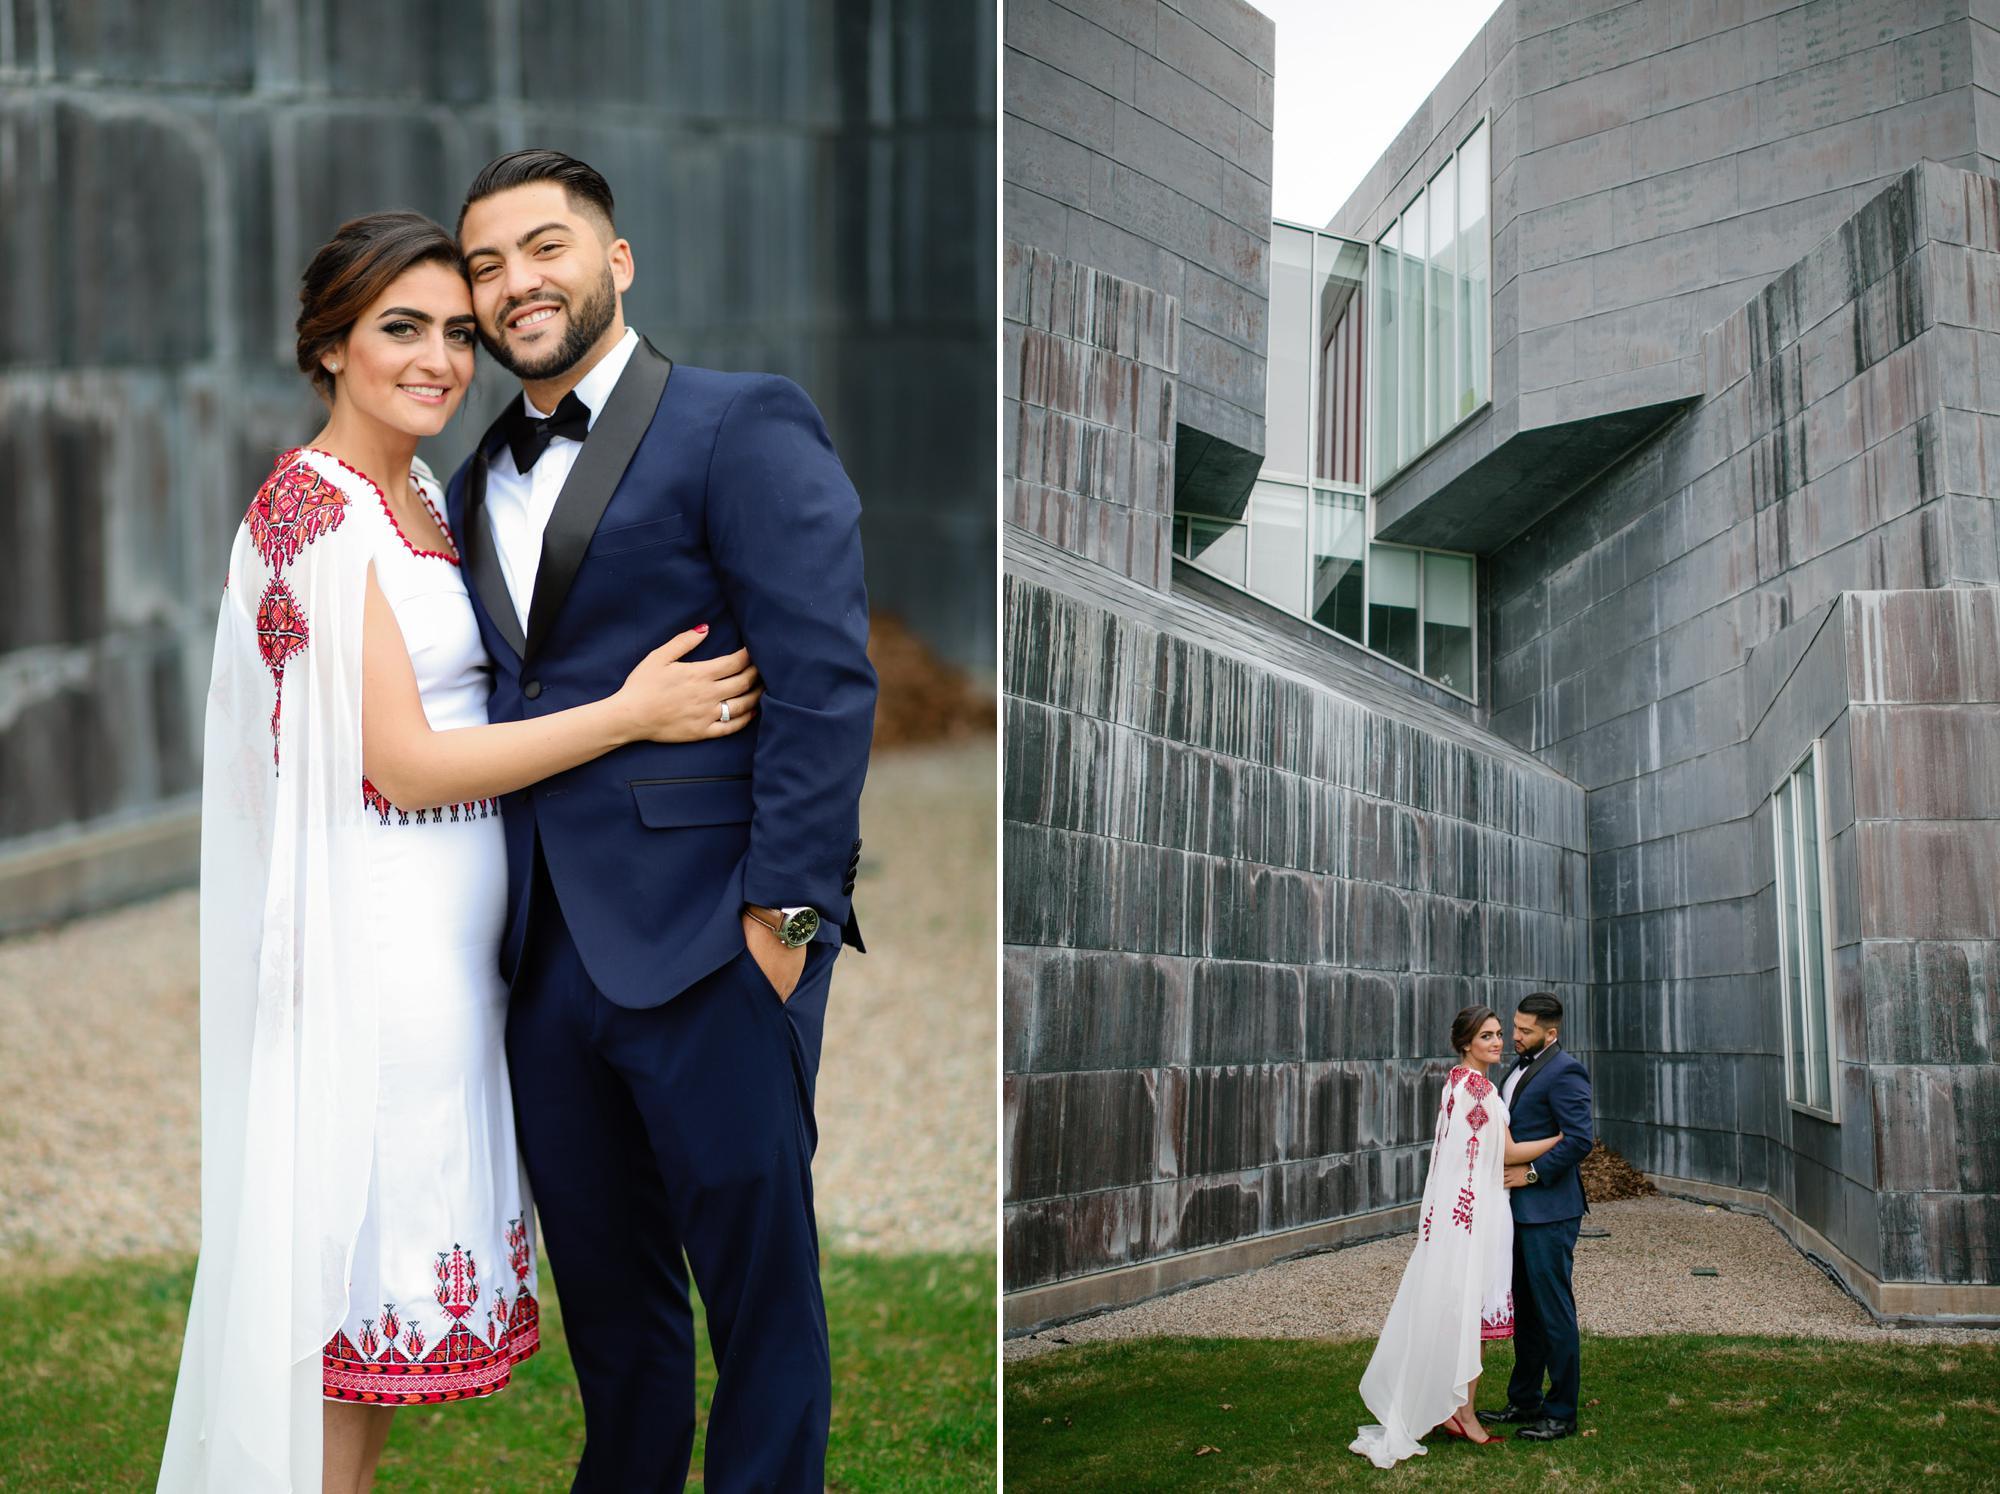 toledo-museum-glass-pavilion-wedding-photos-3.jpg